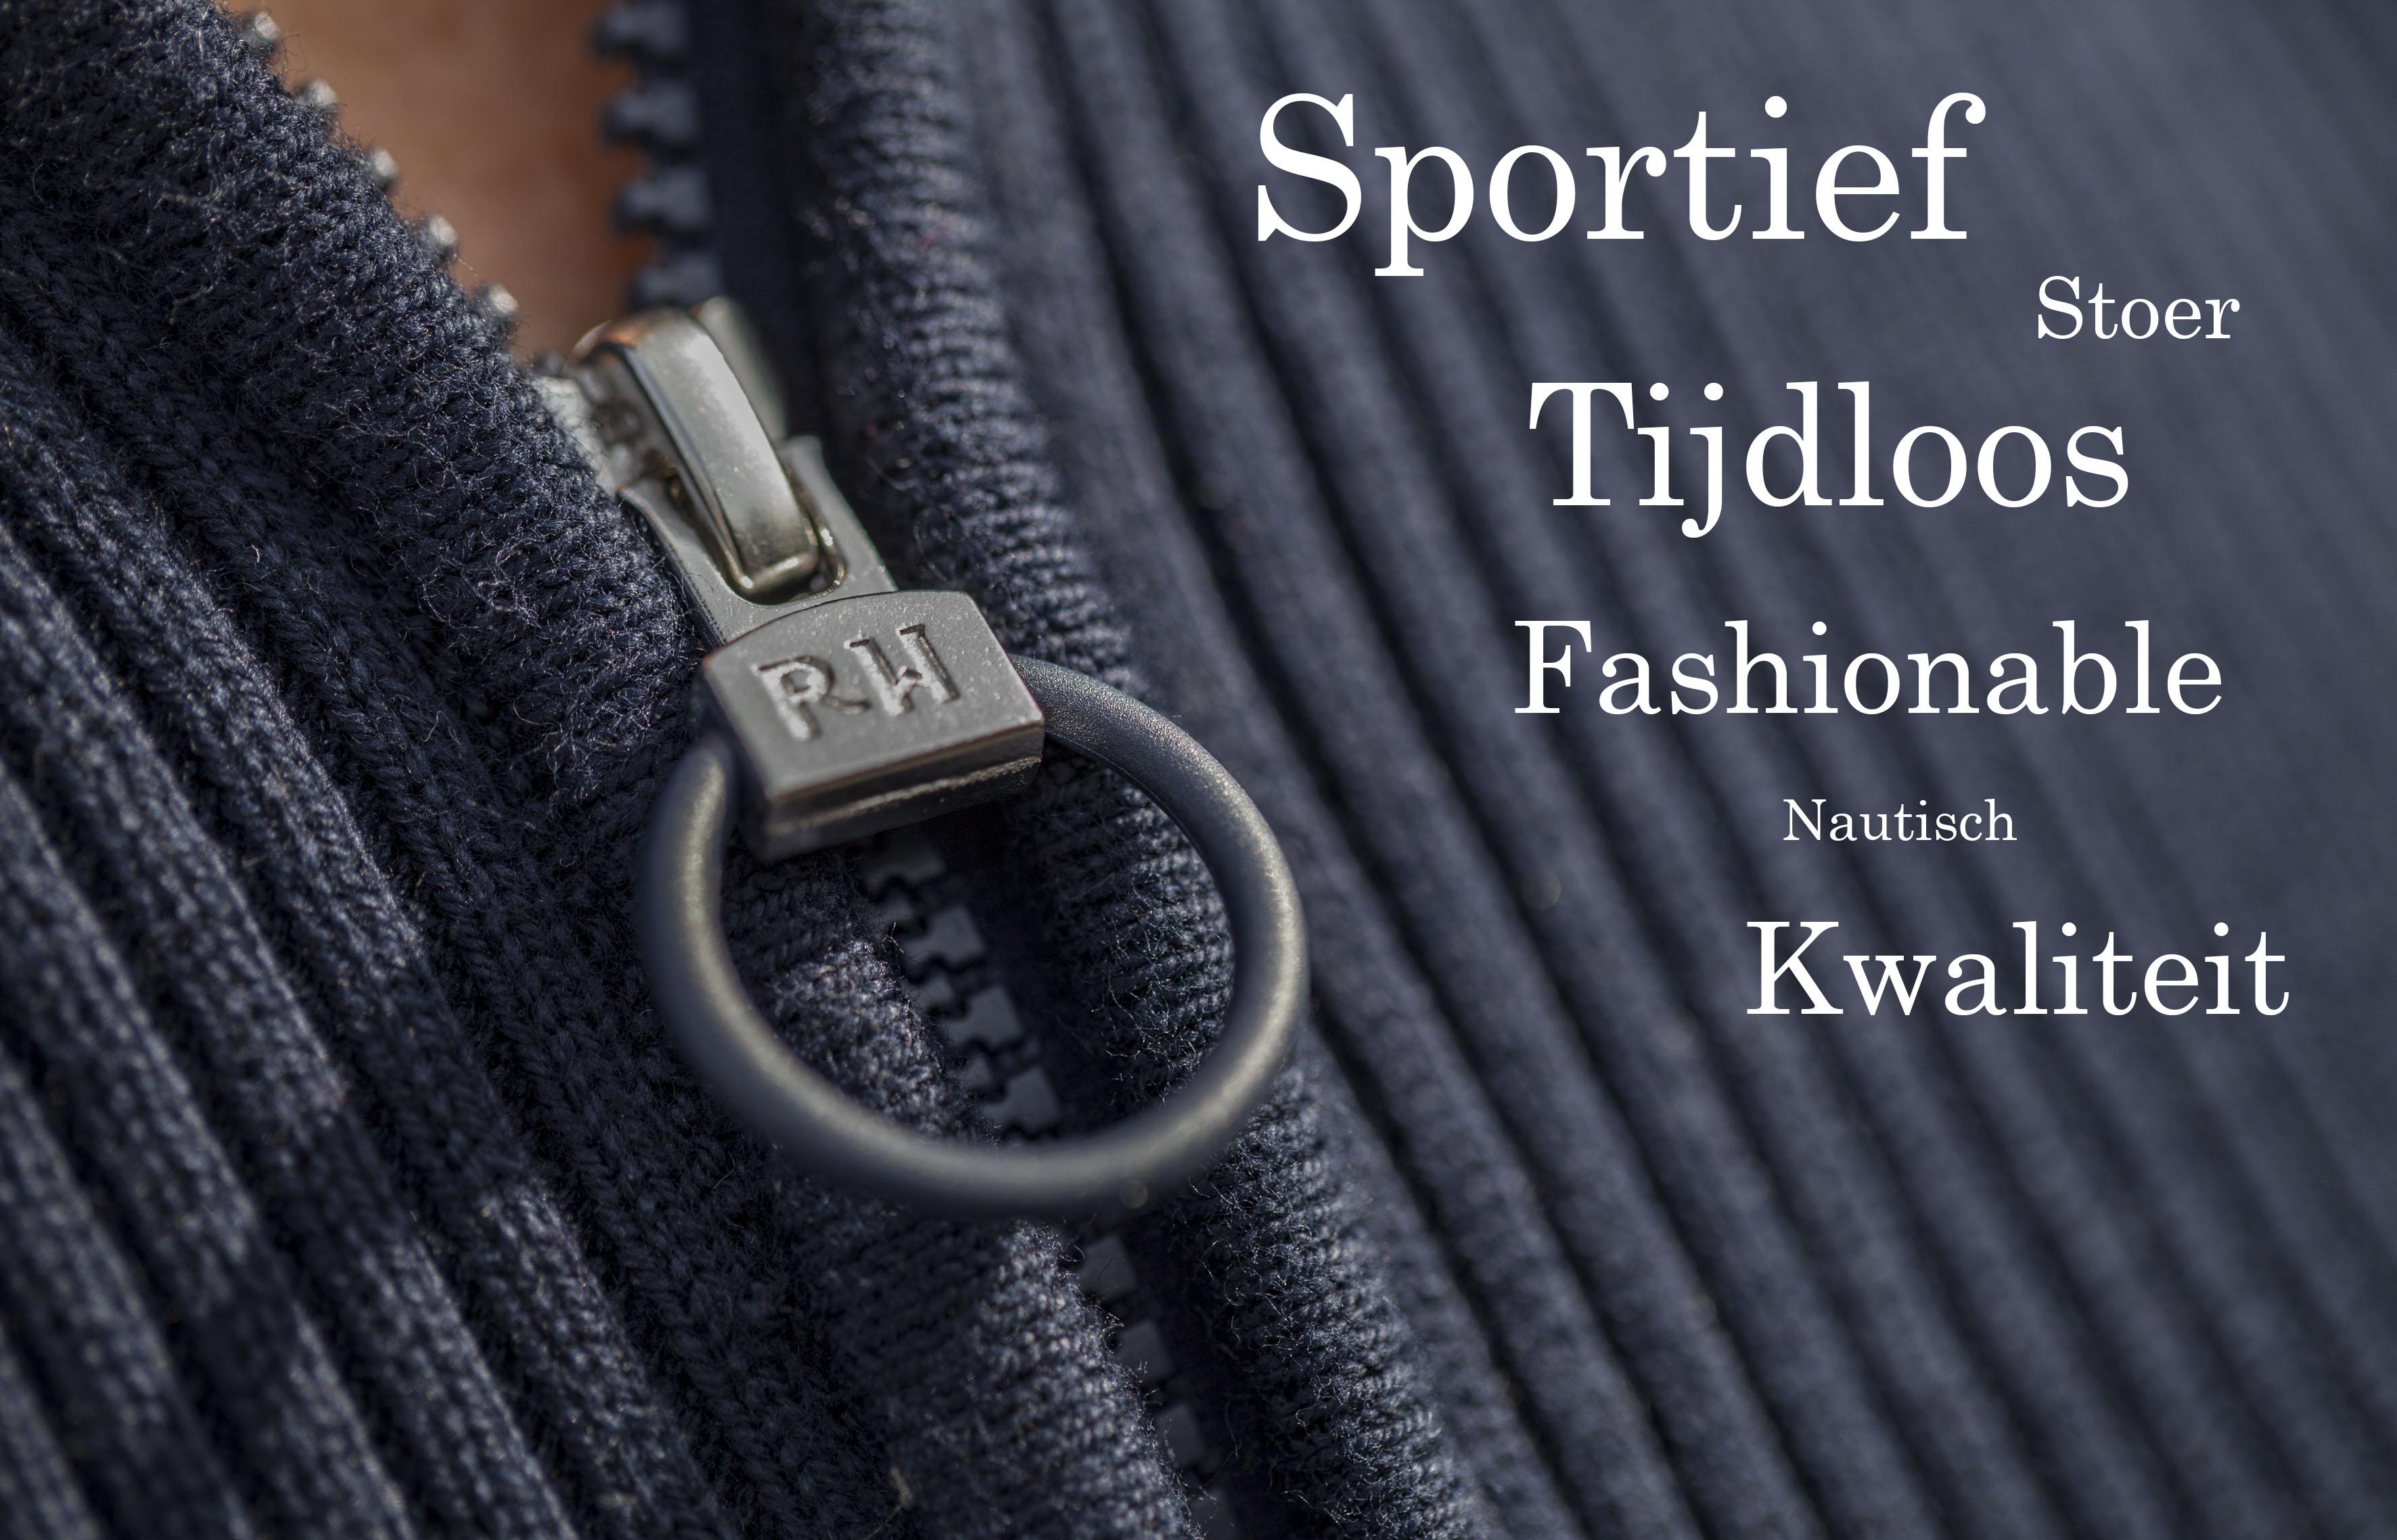 Sportief / Stoer / Tijdloos / Fashionable / Nautisch / Kwaliteit